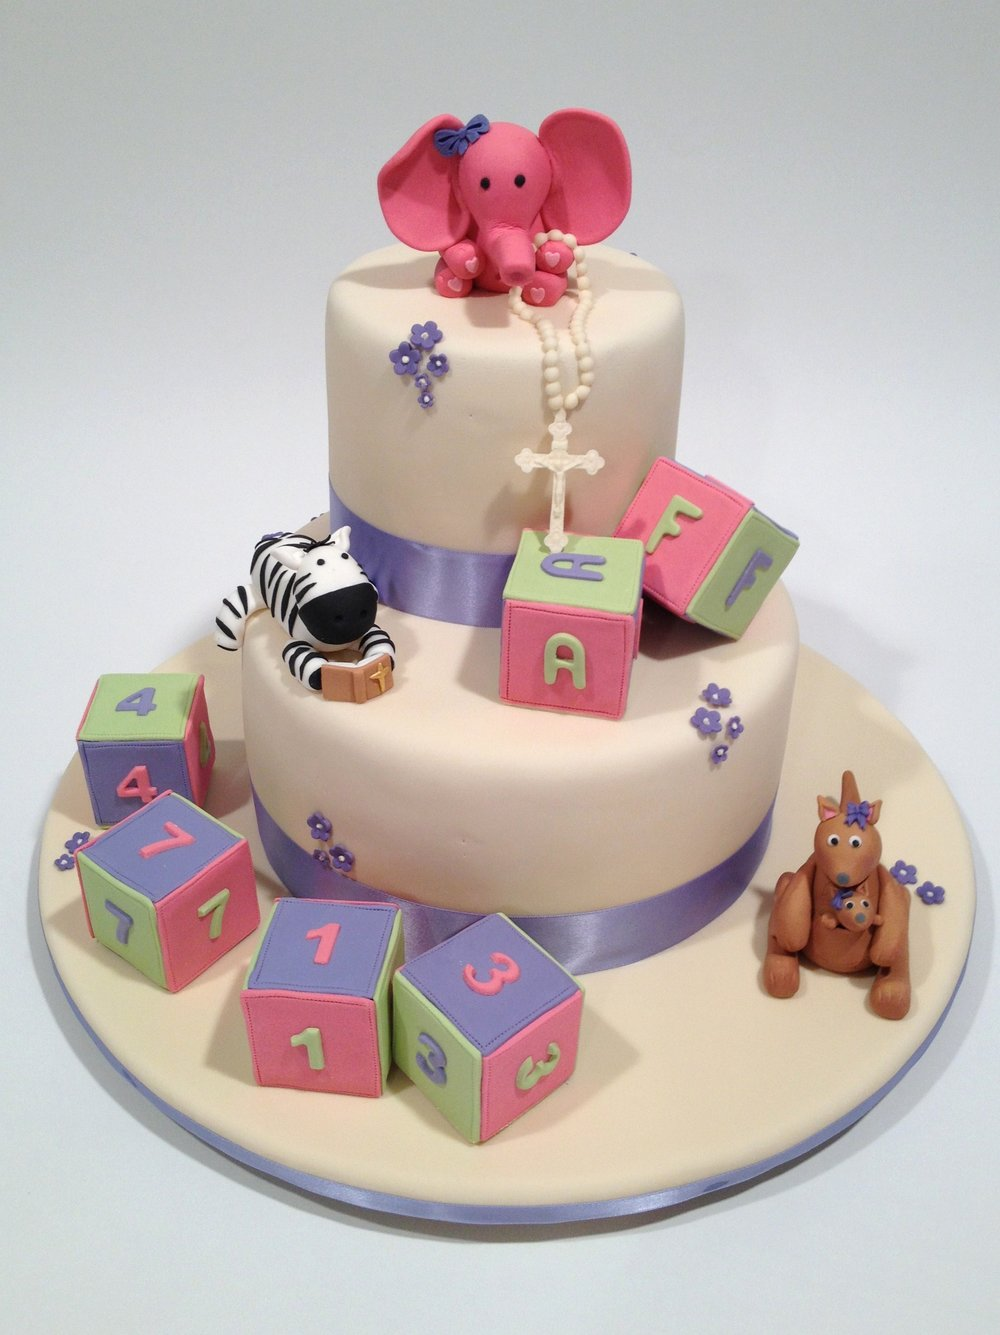 Baby Allison's christening cake